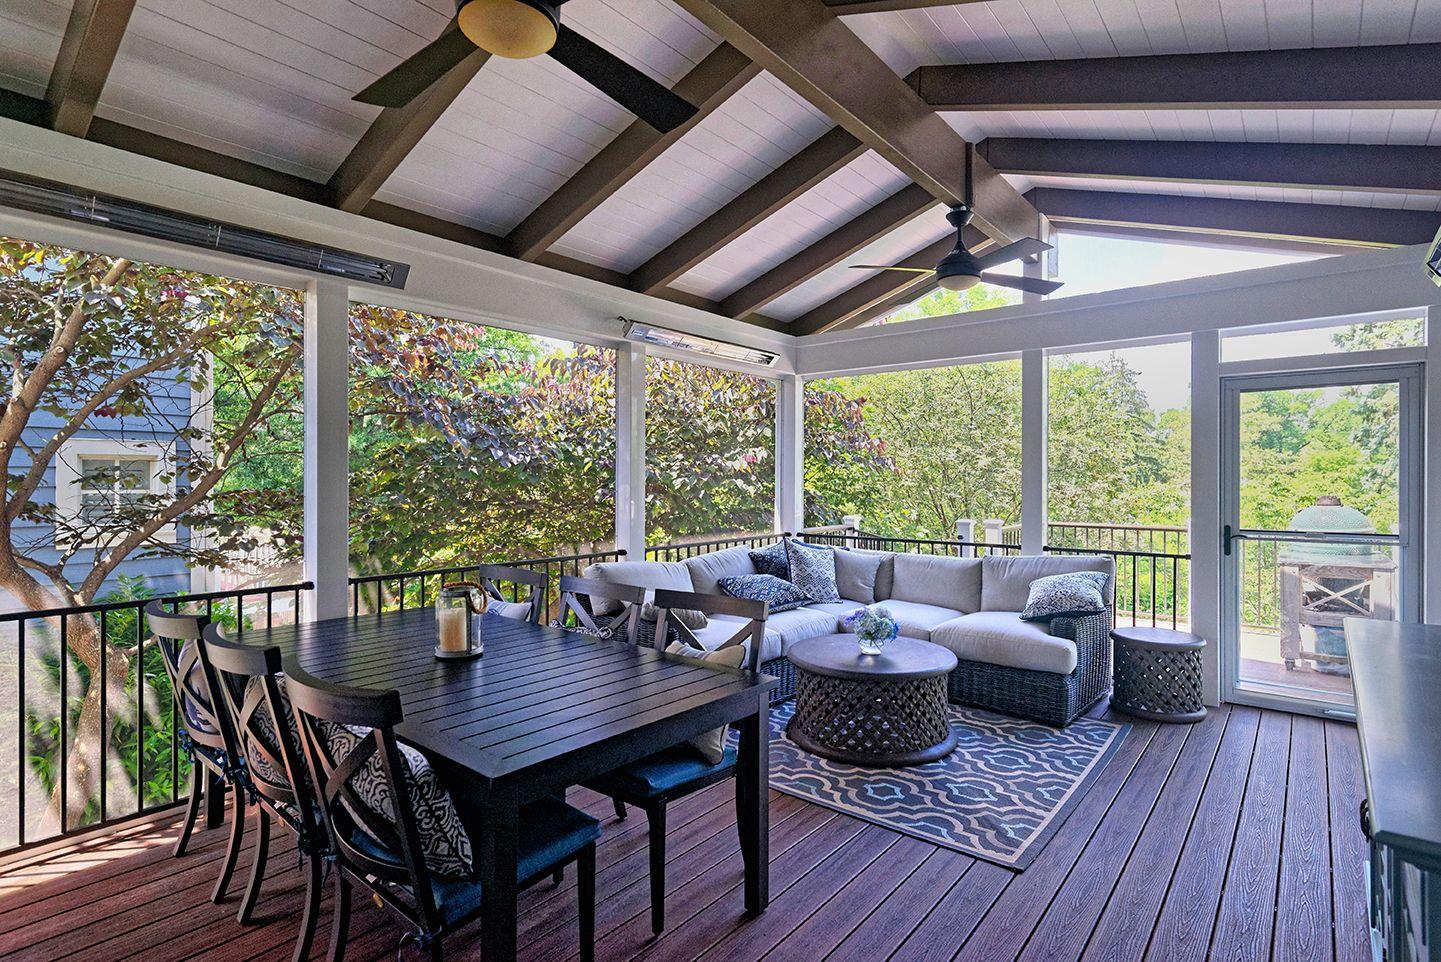 Home Patio Outdoor Ceiling Fans Backyard Porch